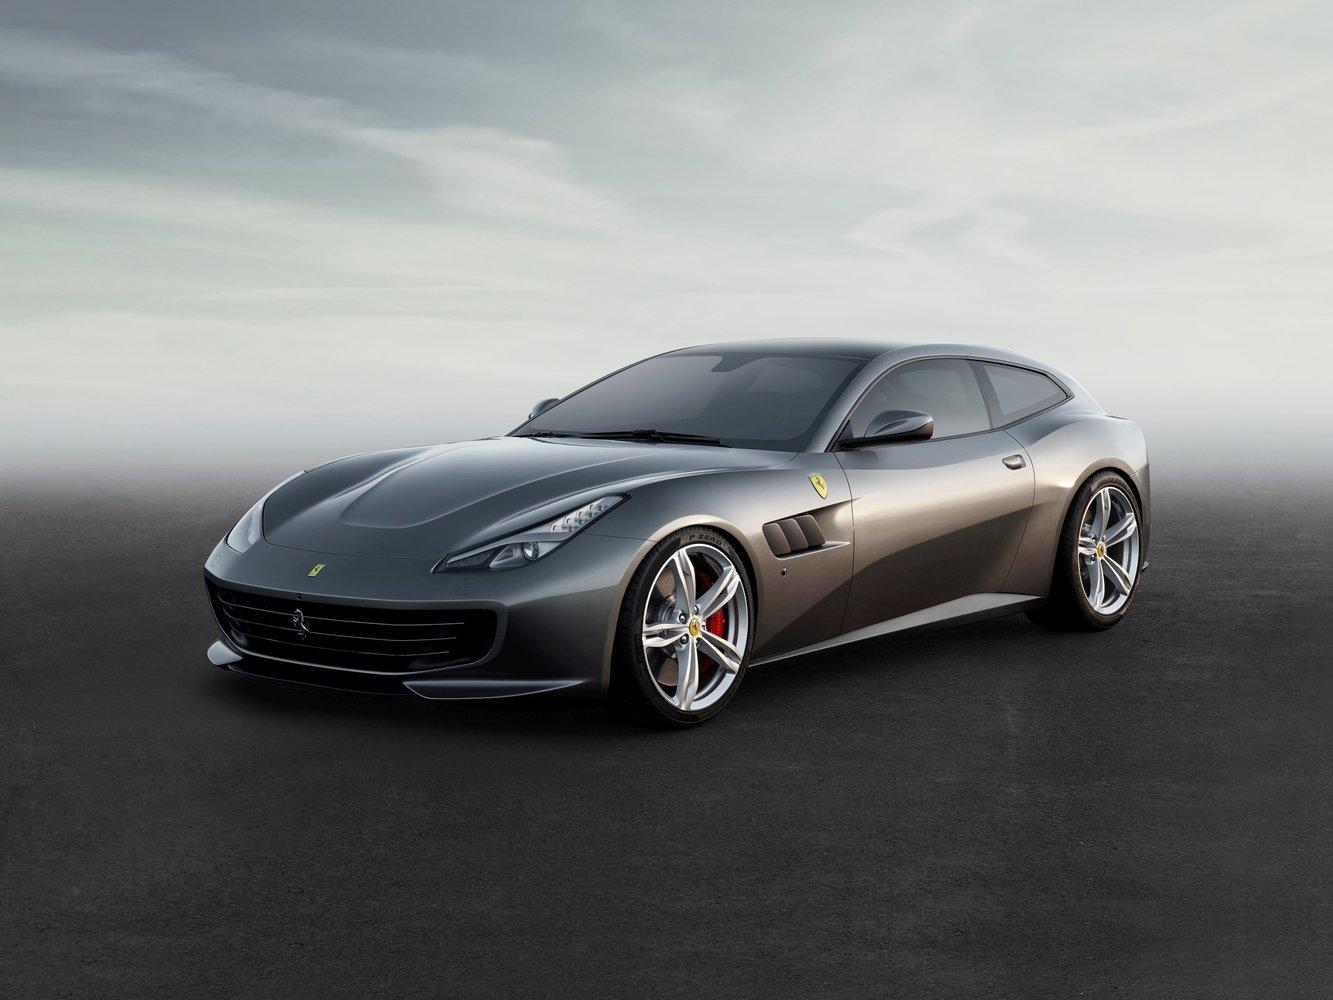 ferrari Ferrari GTC4Lusso